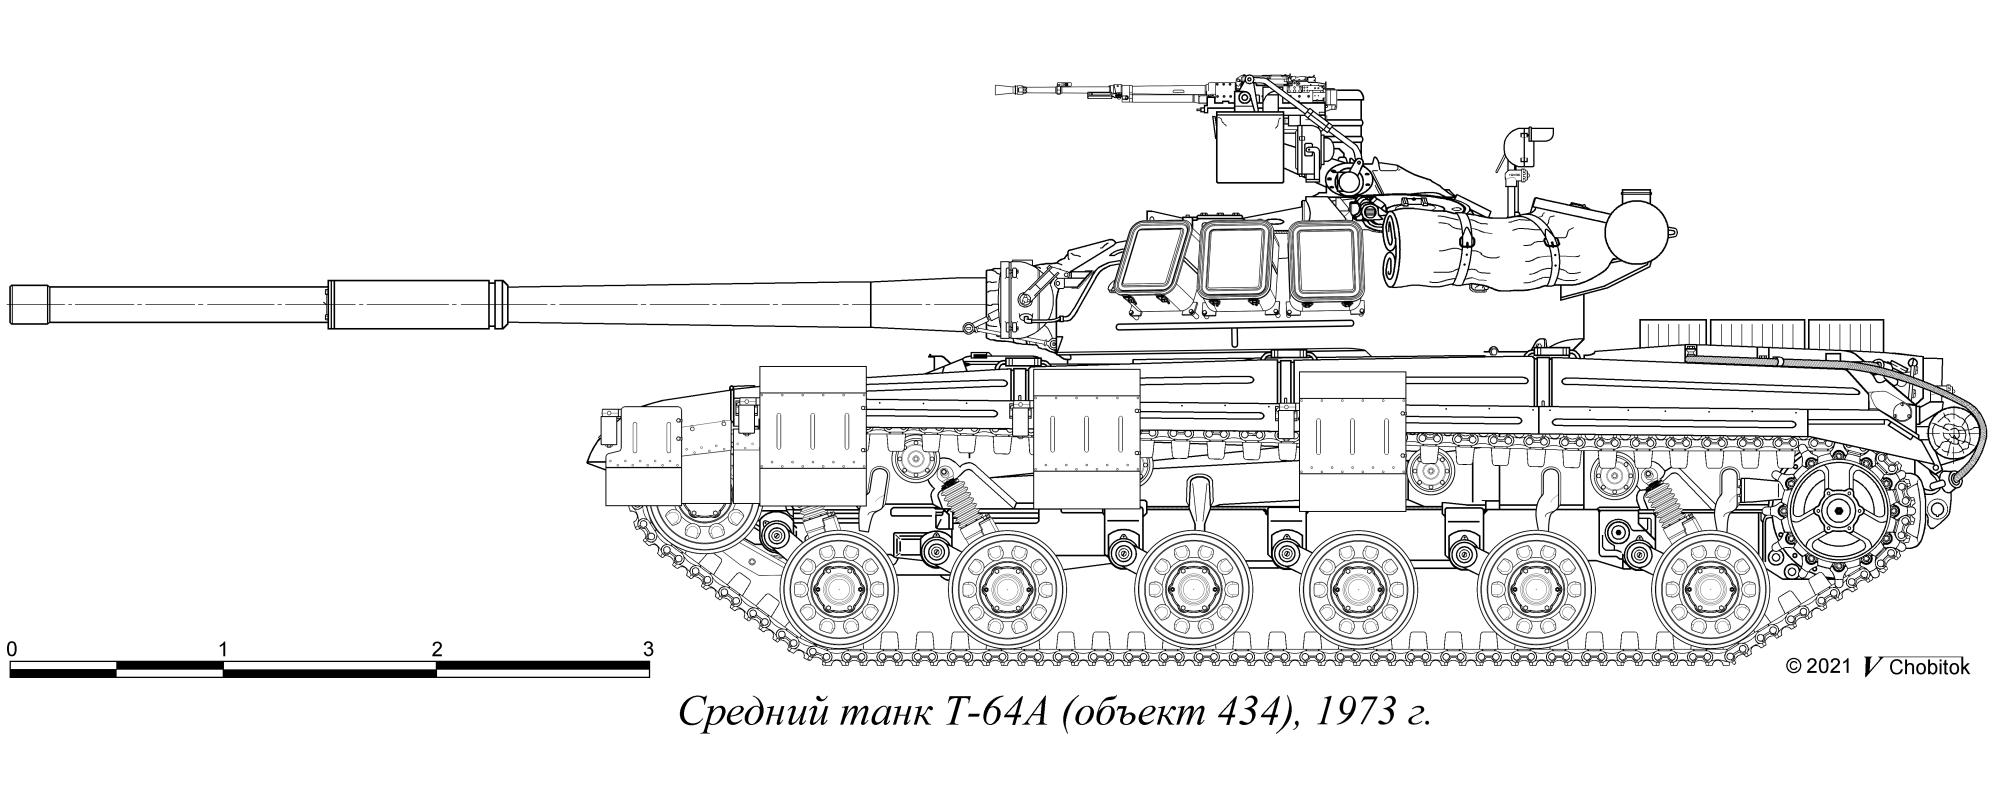 http://armor.kiev.ua/Tanks/Modern/T64/1971/434_73_1.png